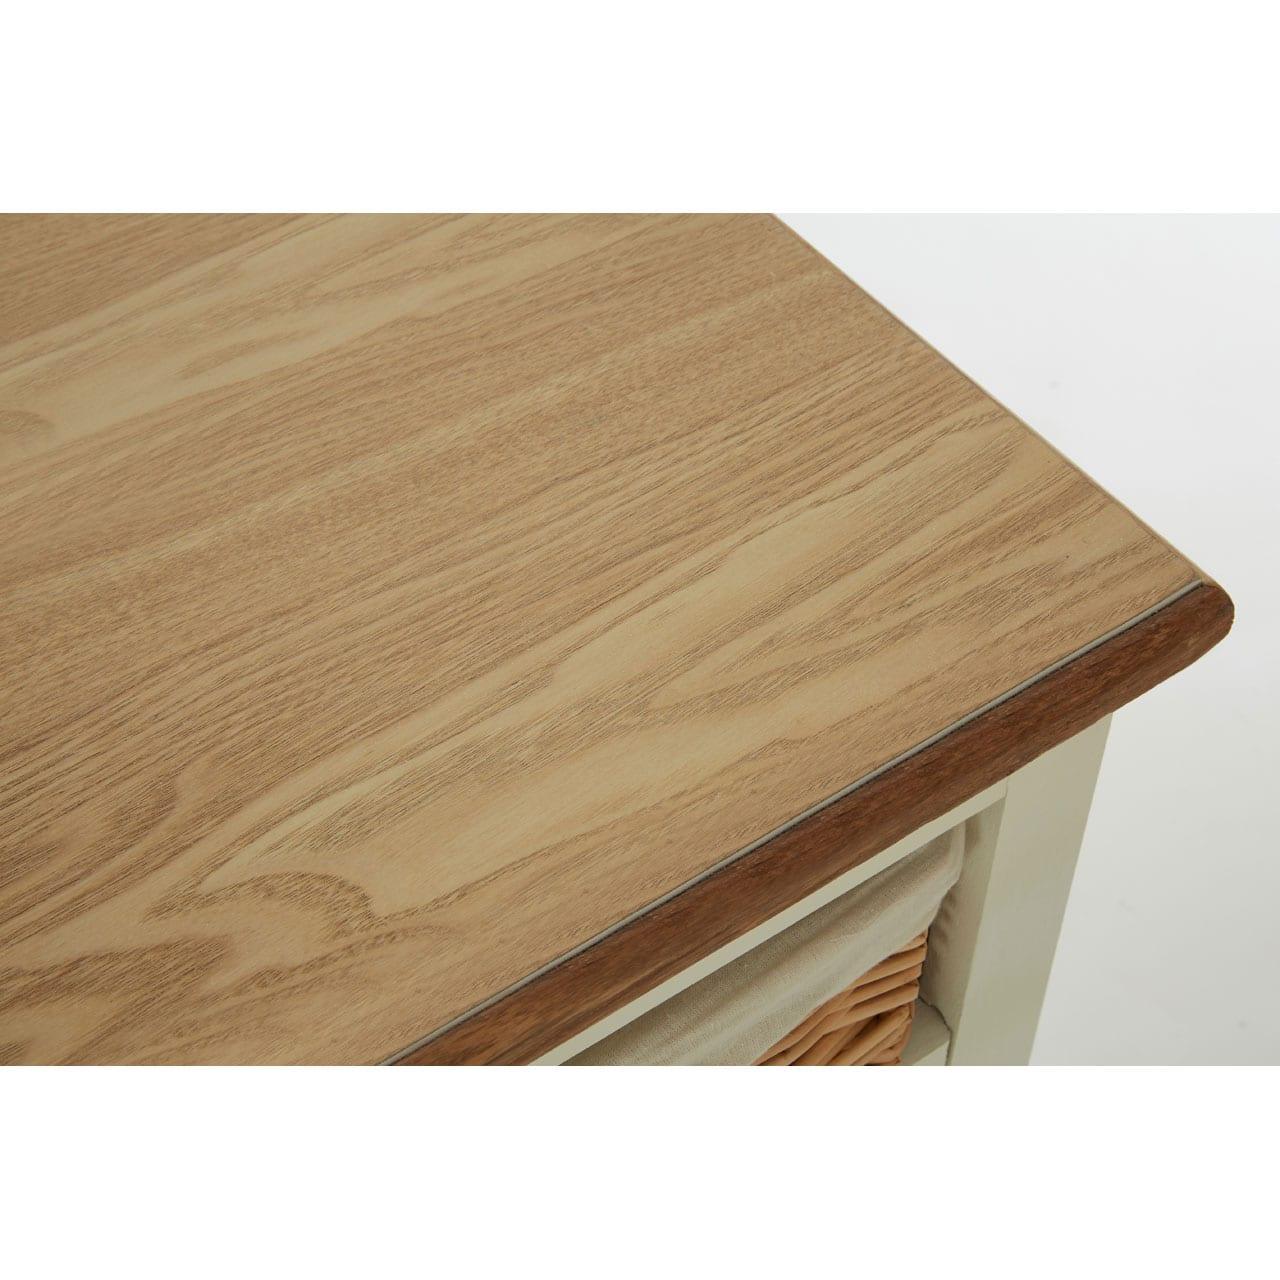 Purbeck Cream Sideboard